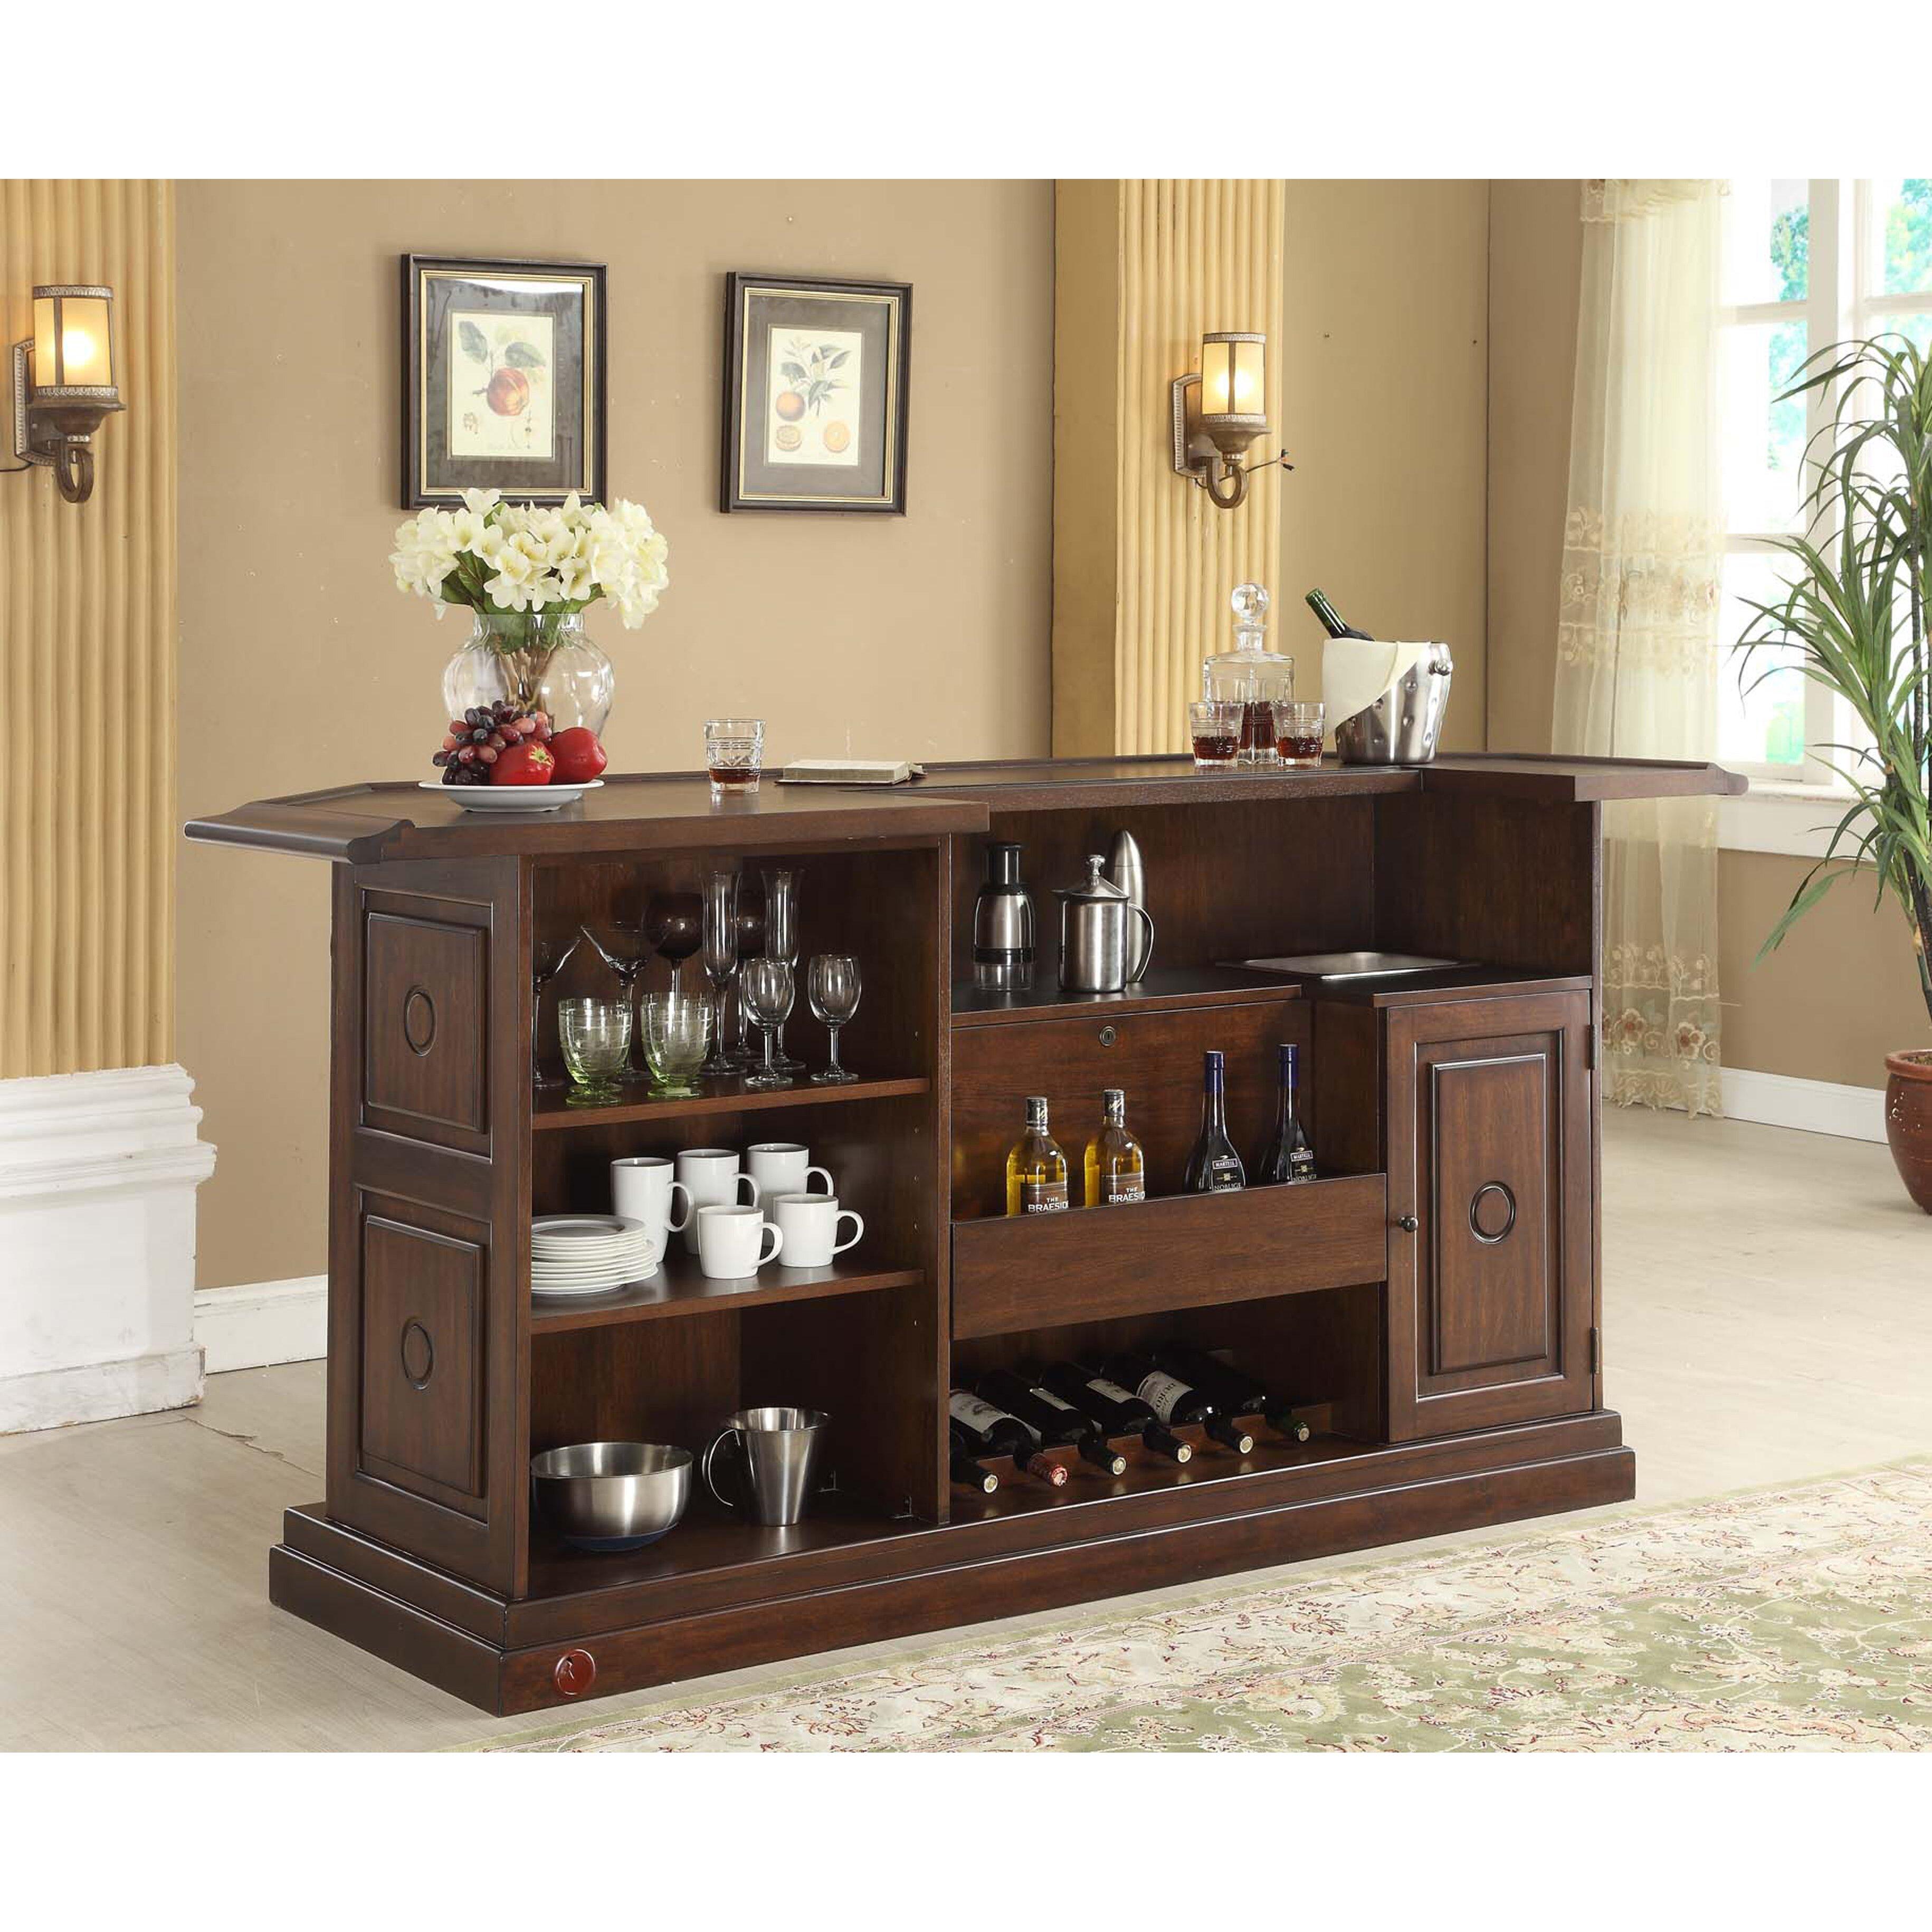 Eci Furniture Ashton Series Bar With Wine Storage Reviews Wayfair